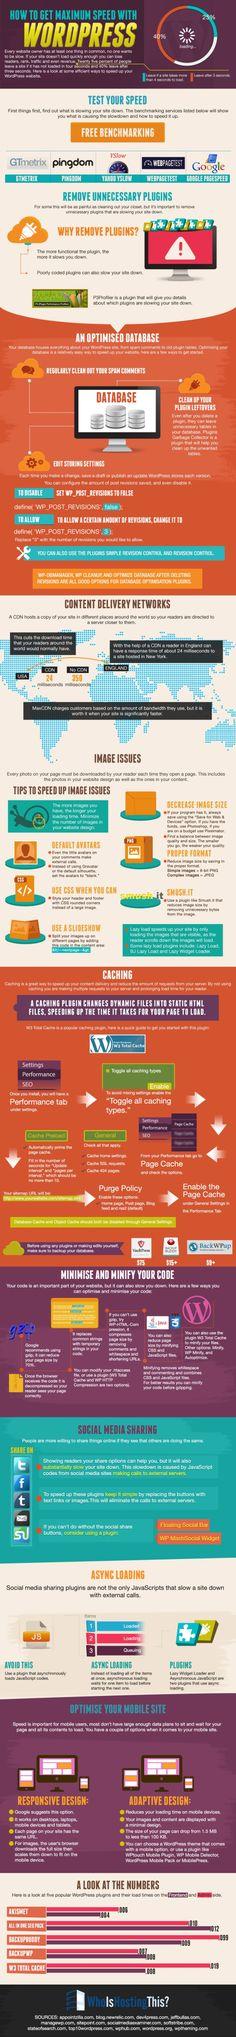 How to Get Maximum Speed with #WordPress #infografía